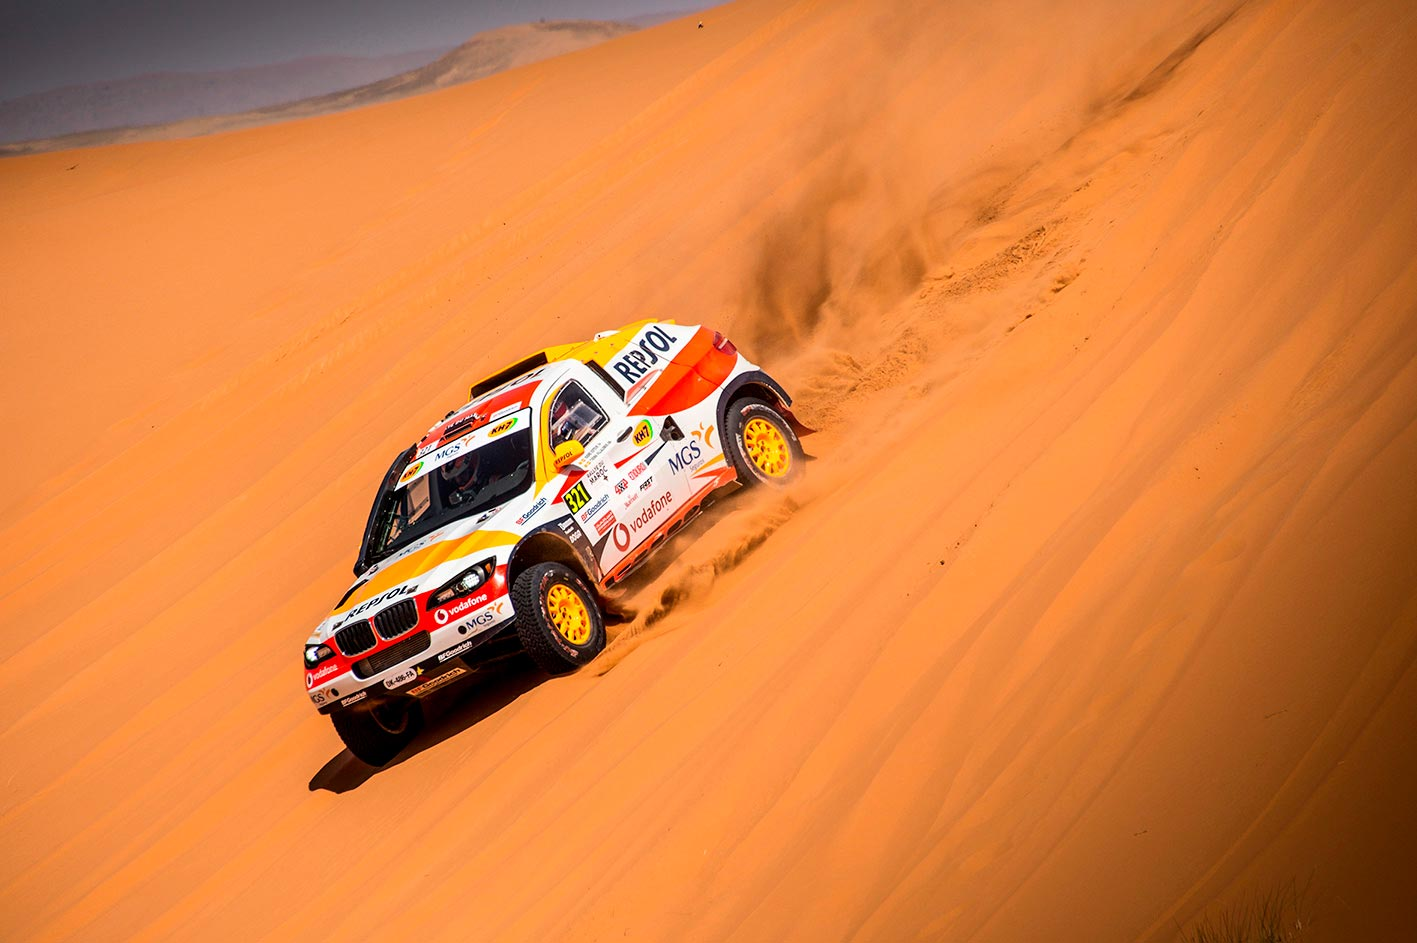 Isidre Esteve descendiendo una duna con su coche